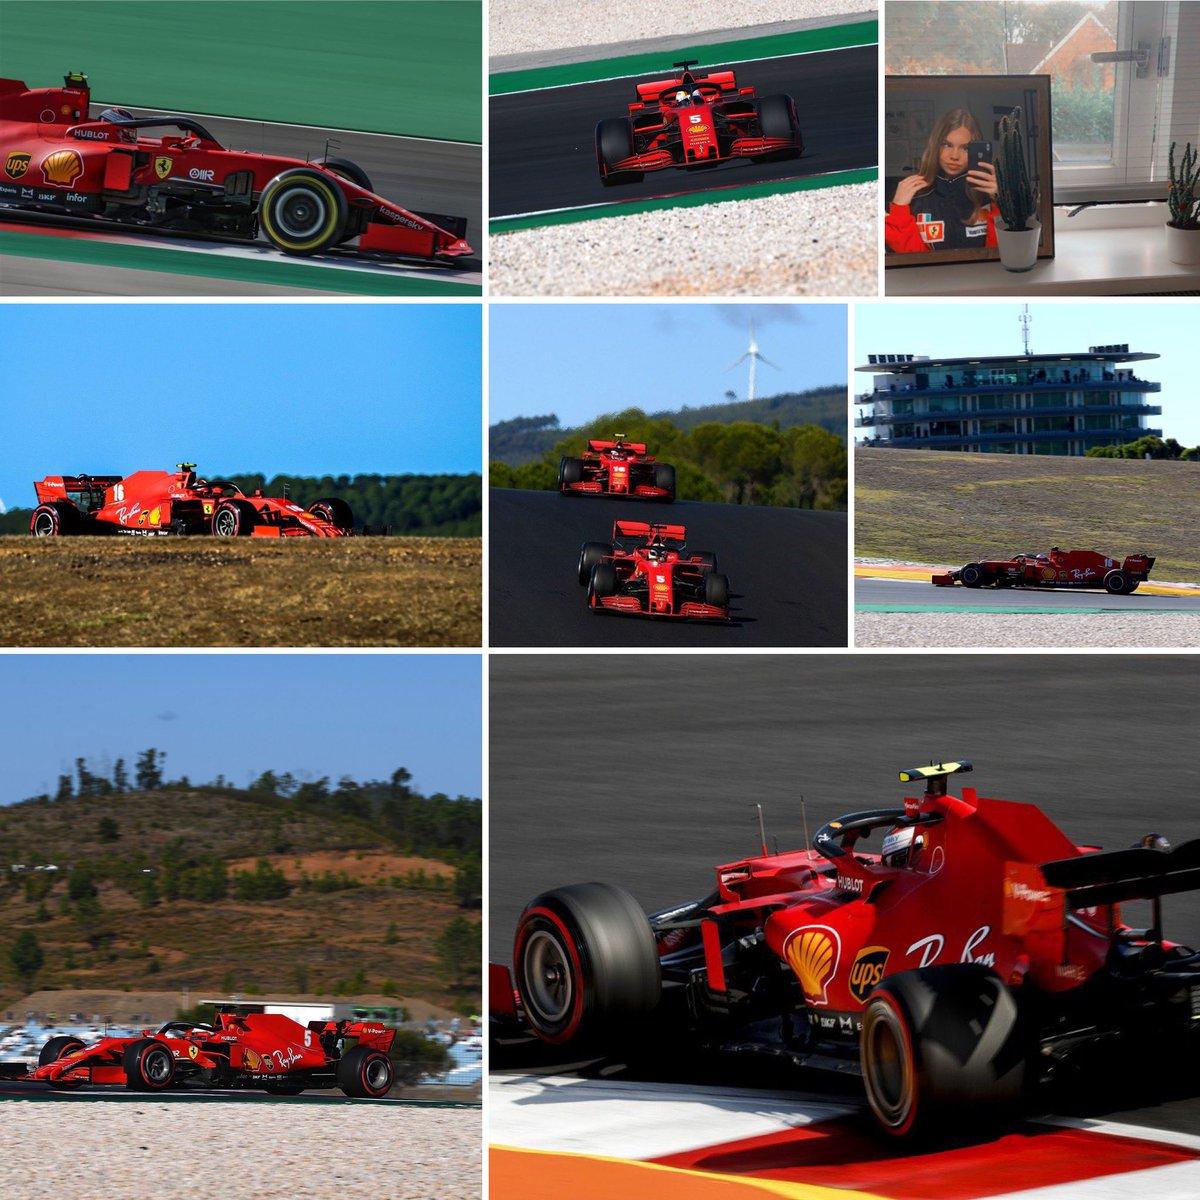 Portuguese GP 2020 Pictures Part 14 #PortugueseGP #Tifosi #essereFerrari #Ferrari #SF1000 #Charles16 #Seb5 #CL16  #Tifosiclub #F1 #Vettel #liveyourferraripassion  #Maranello #forzaferrari  #skySportsF1 https://t.co/IXEBEN5vXZ